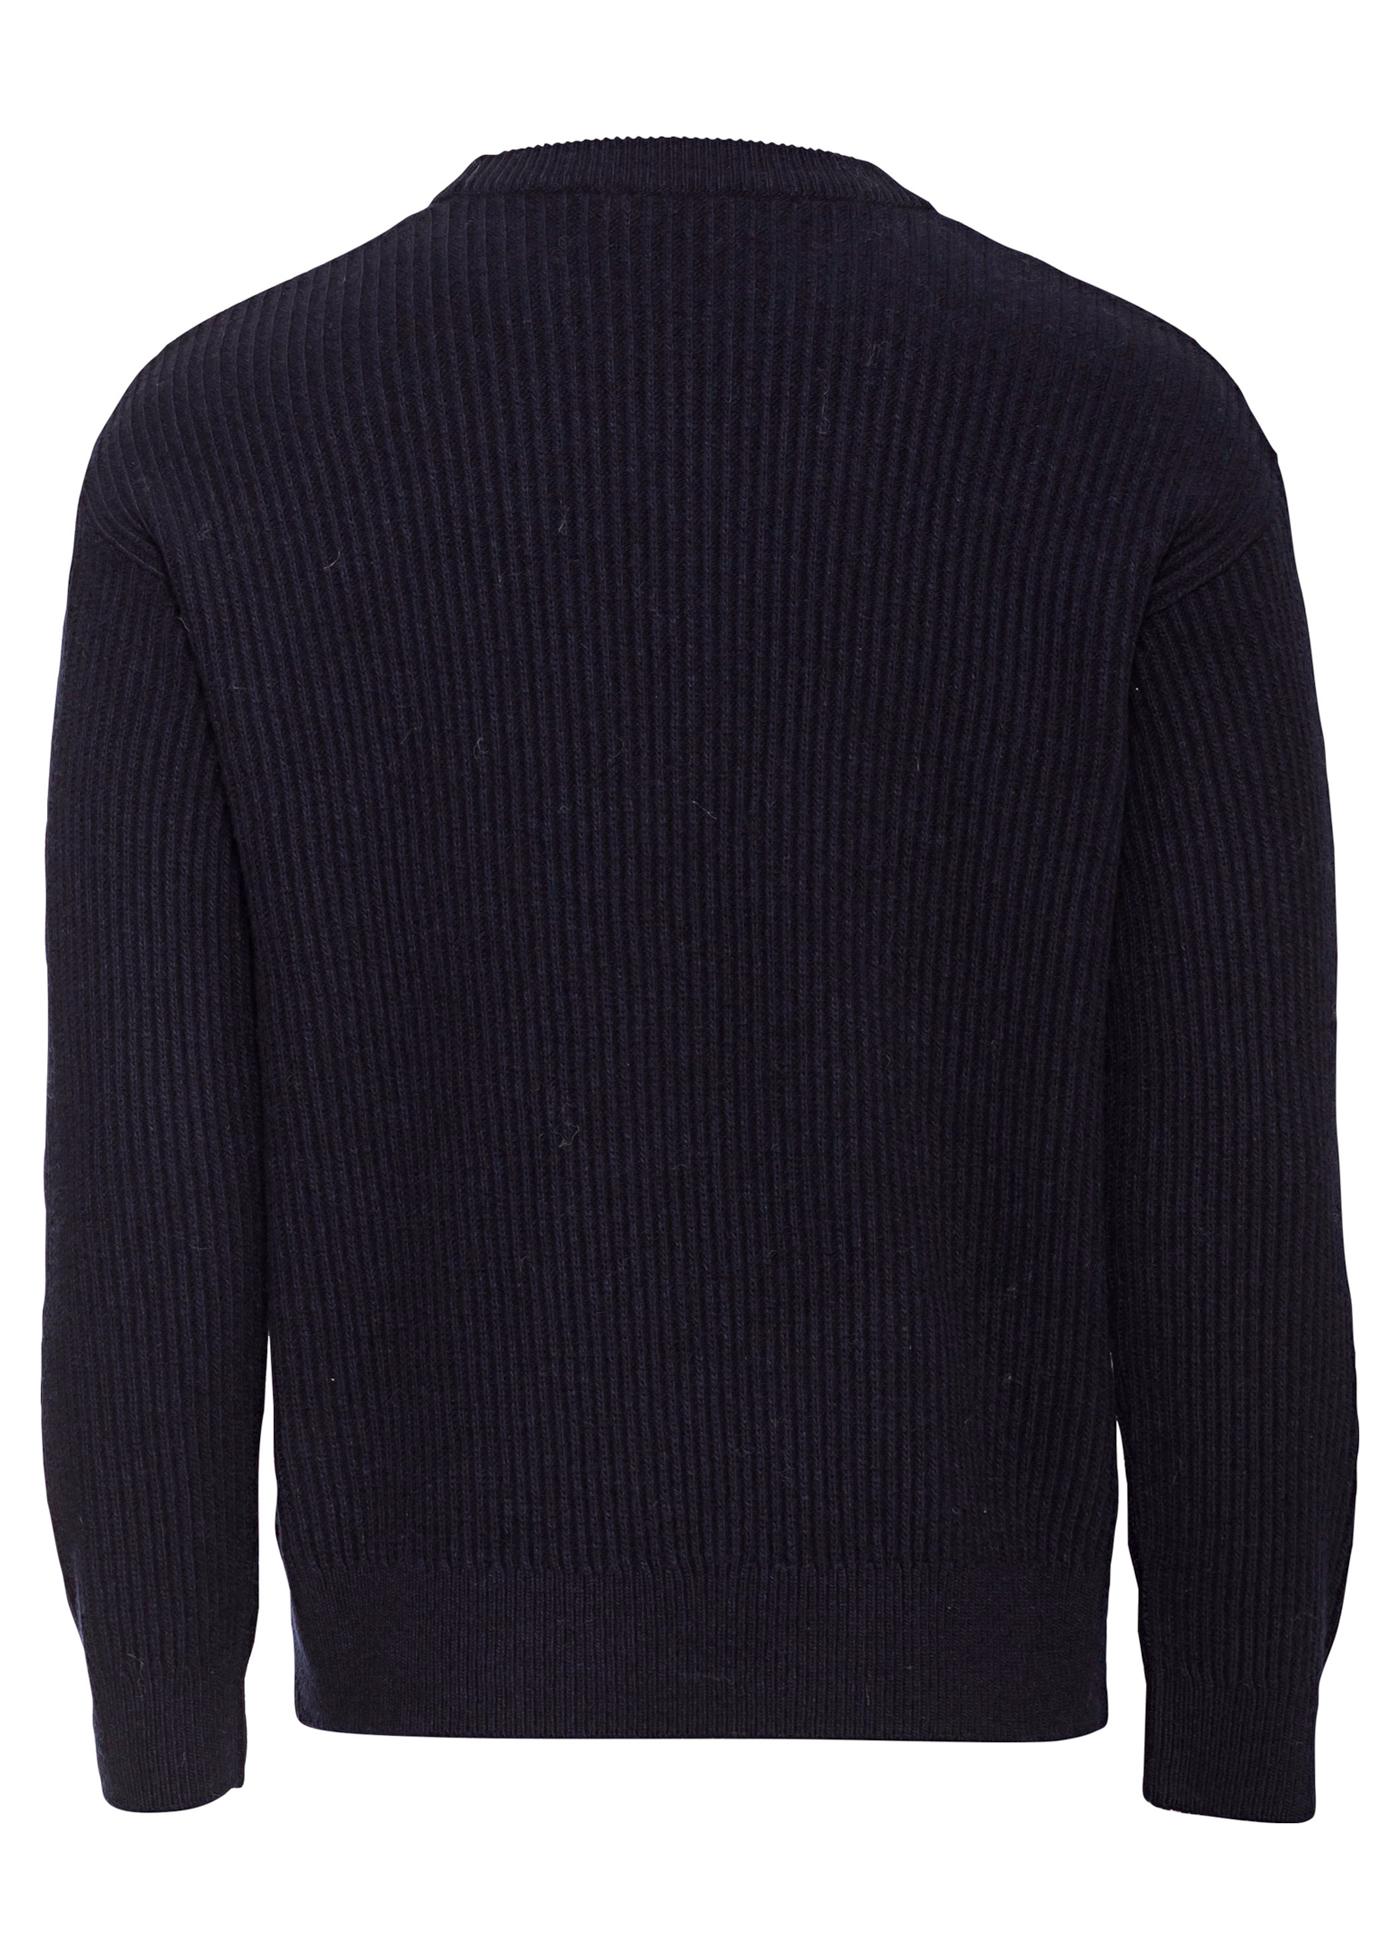 knitted jumper image number 1